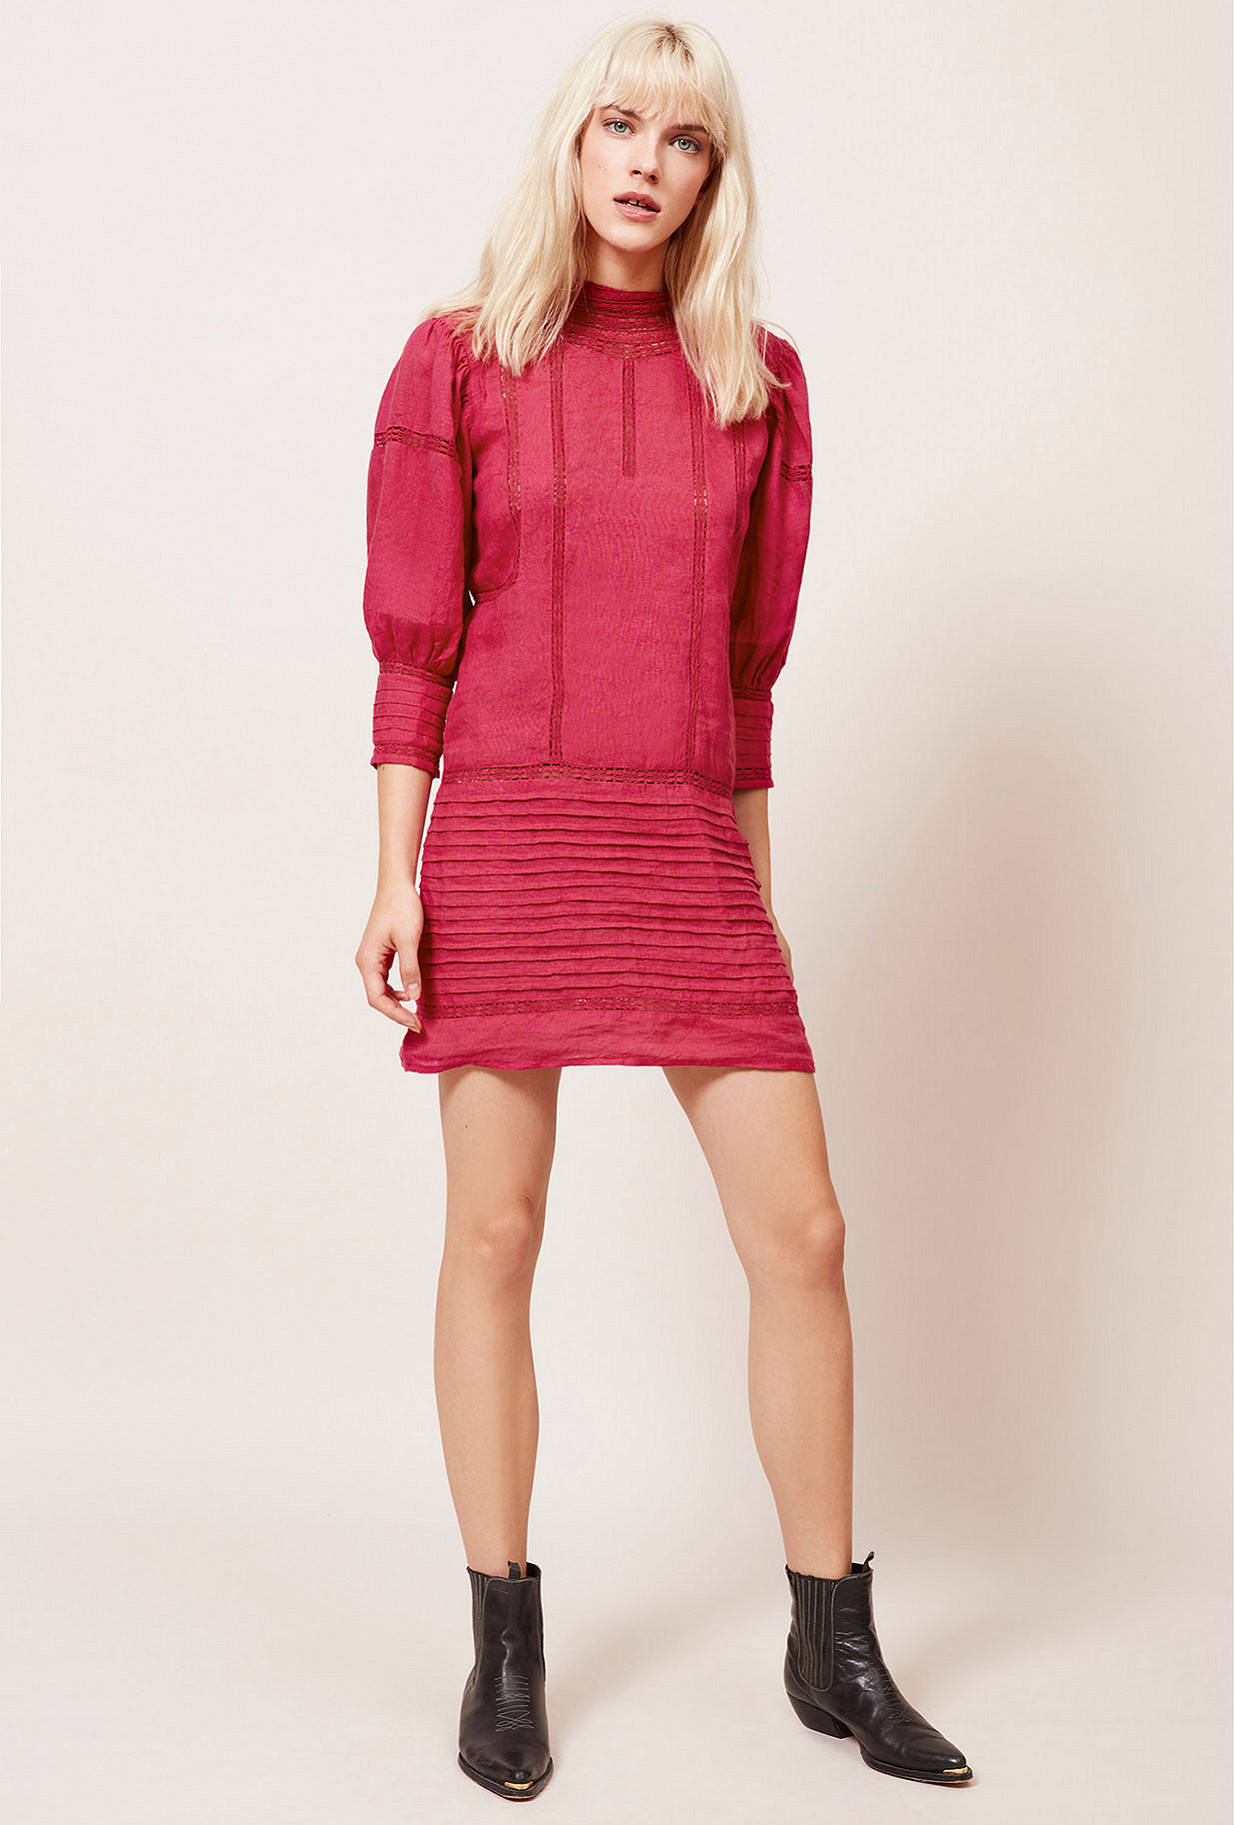 Fushia  Dress  Bianca Mes demoiselles fashion clothes designer Paris